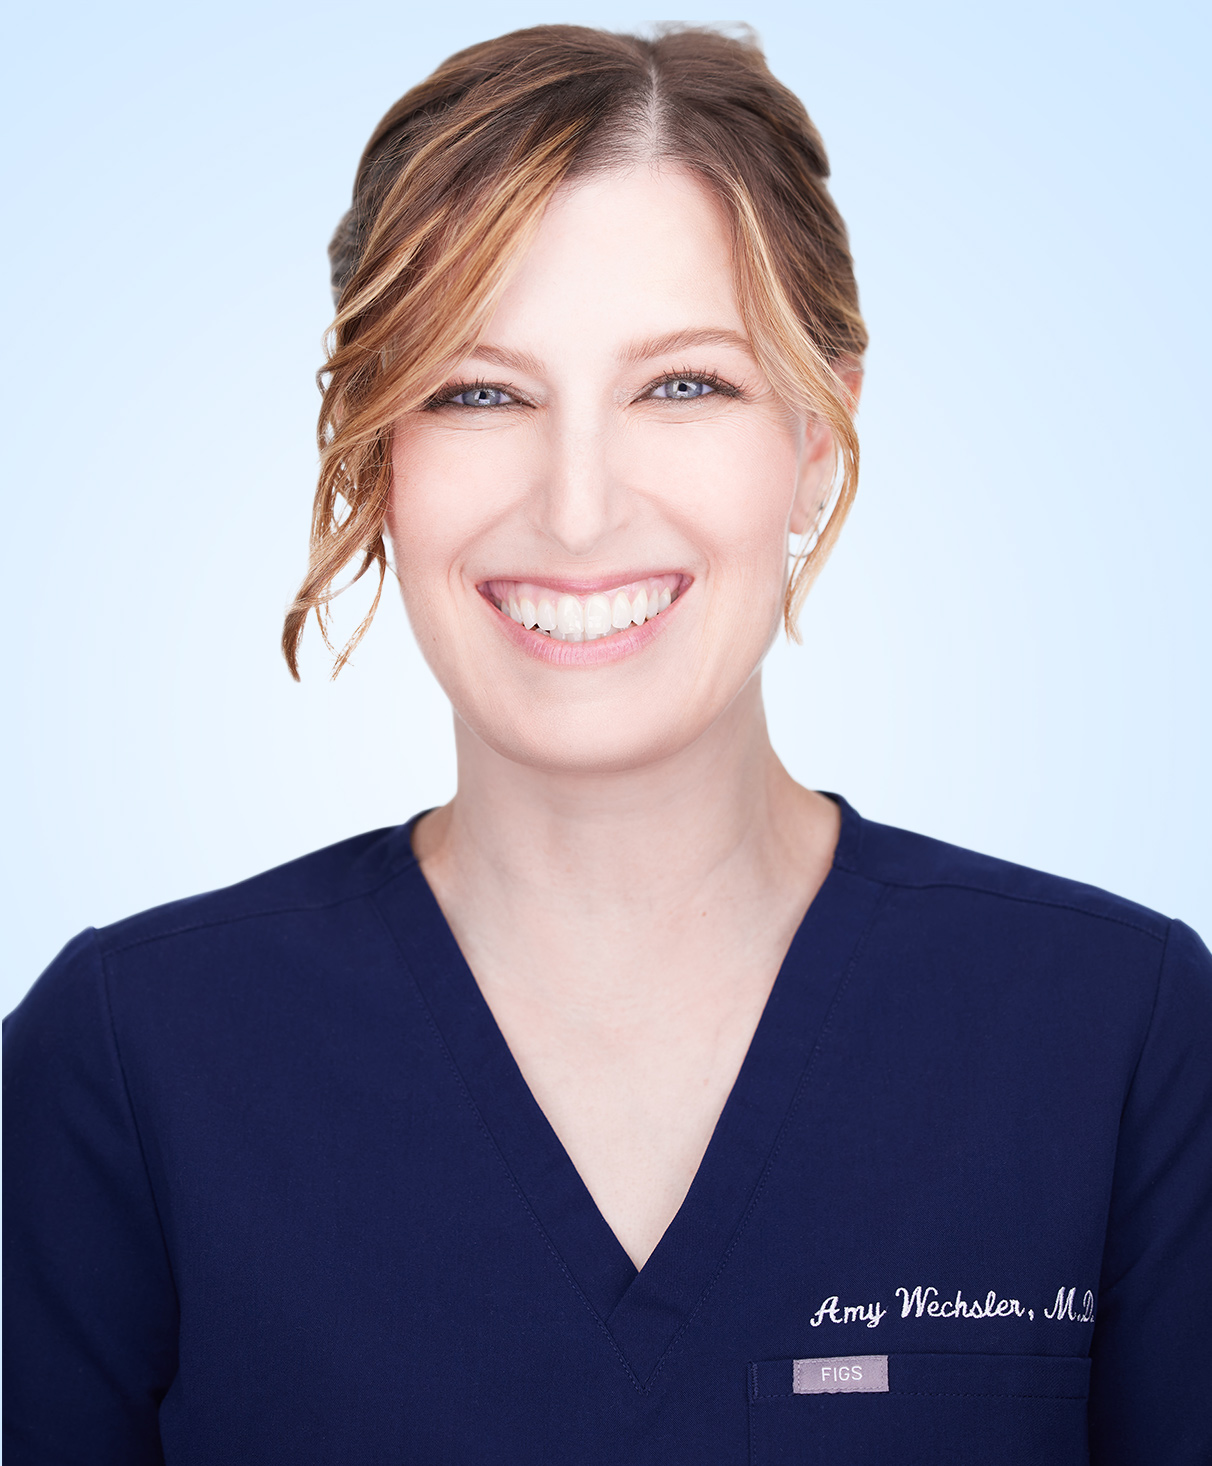 Amy Wechsler